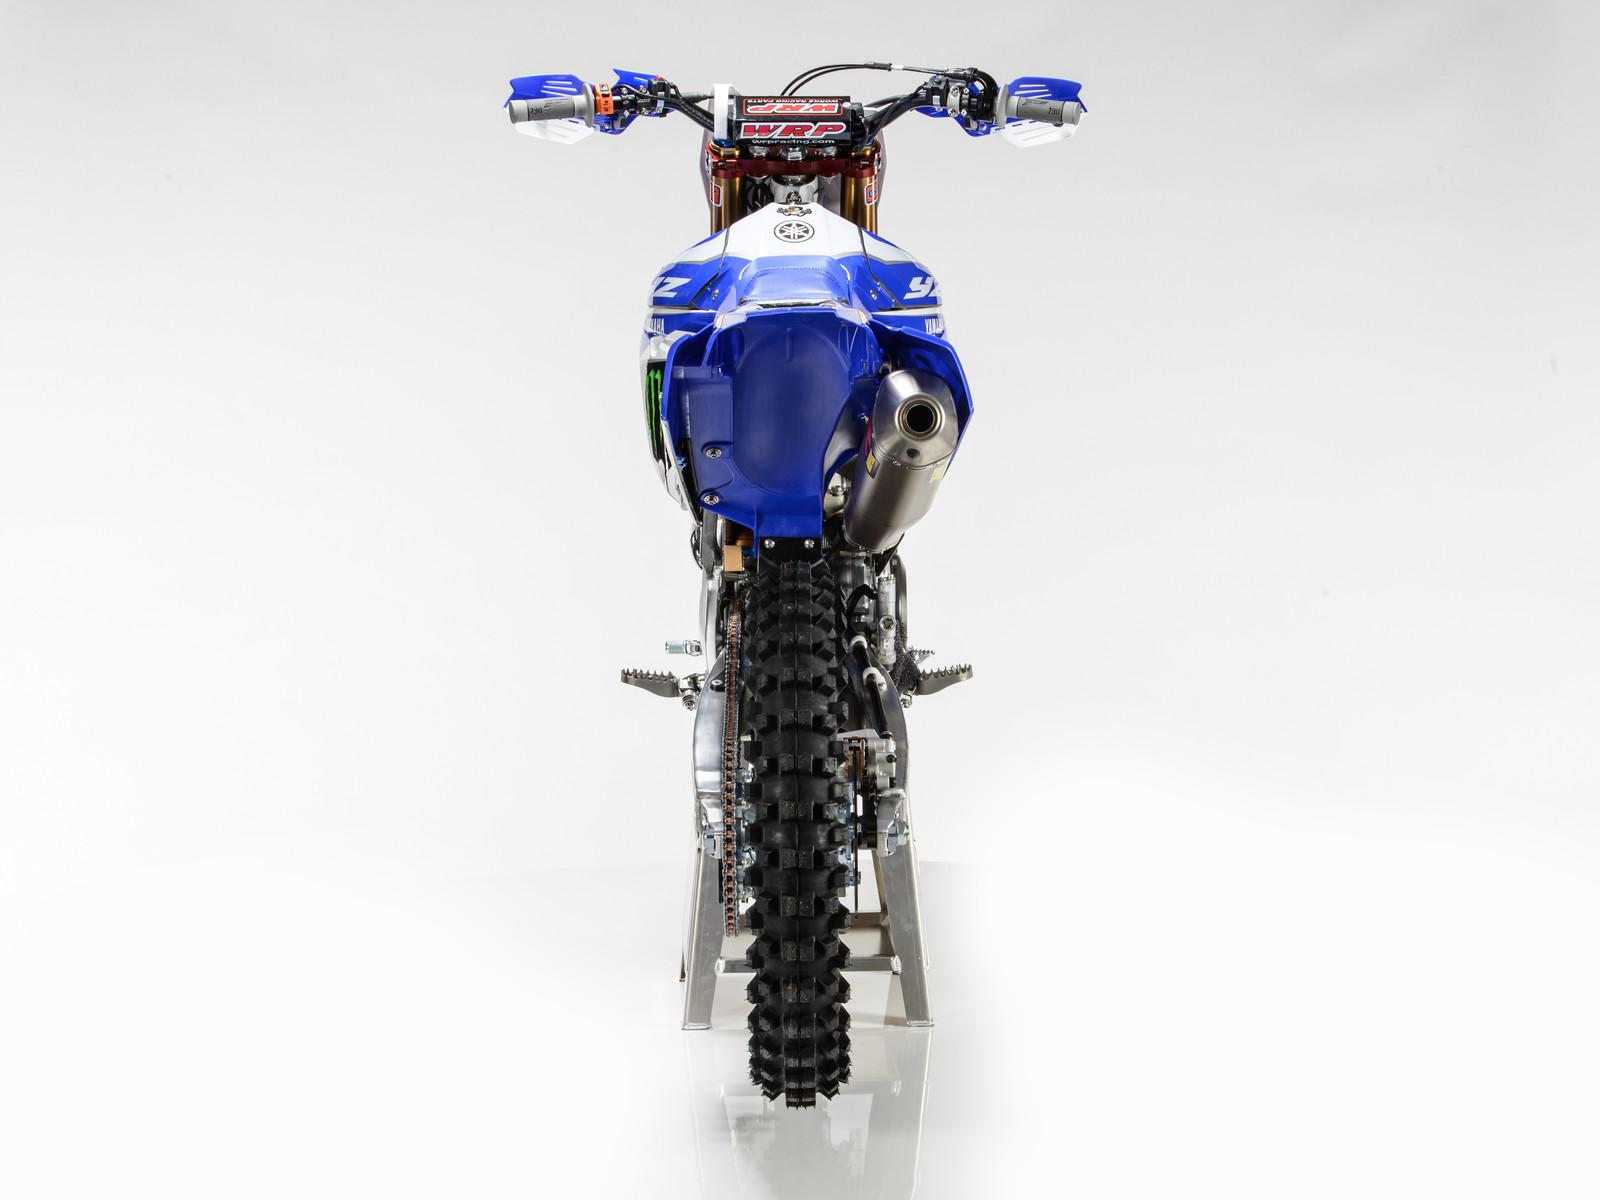 Jeremy van Horebeek's 2017 Monster Energy Yamaha Factory YZ450FM - First Look: 2017 Monster Energy & Wilvo Yamaha MXGP Teams - Motocross Pictures - Vital MX